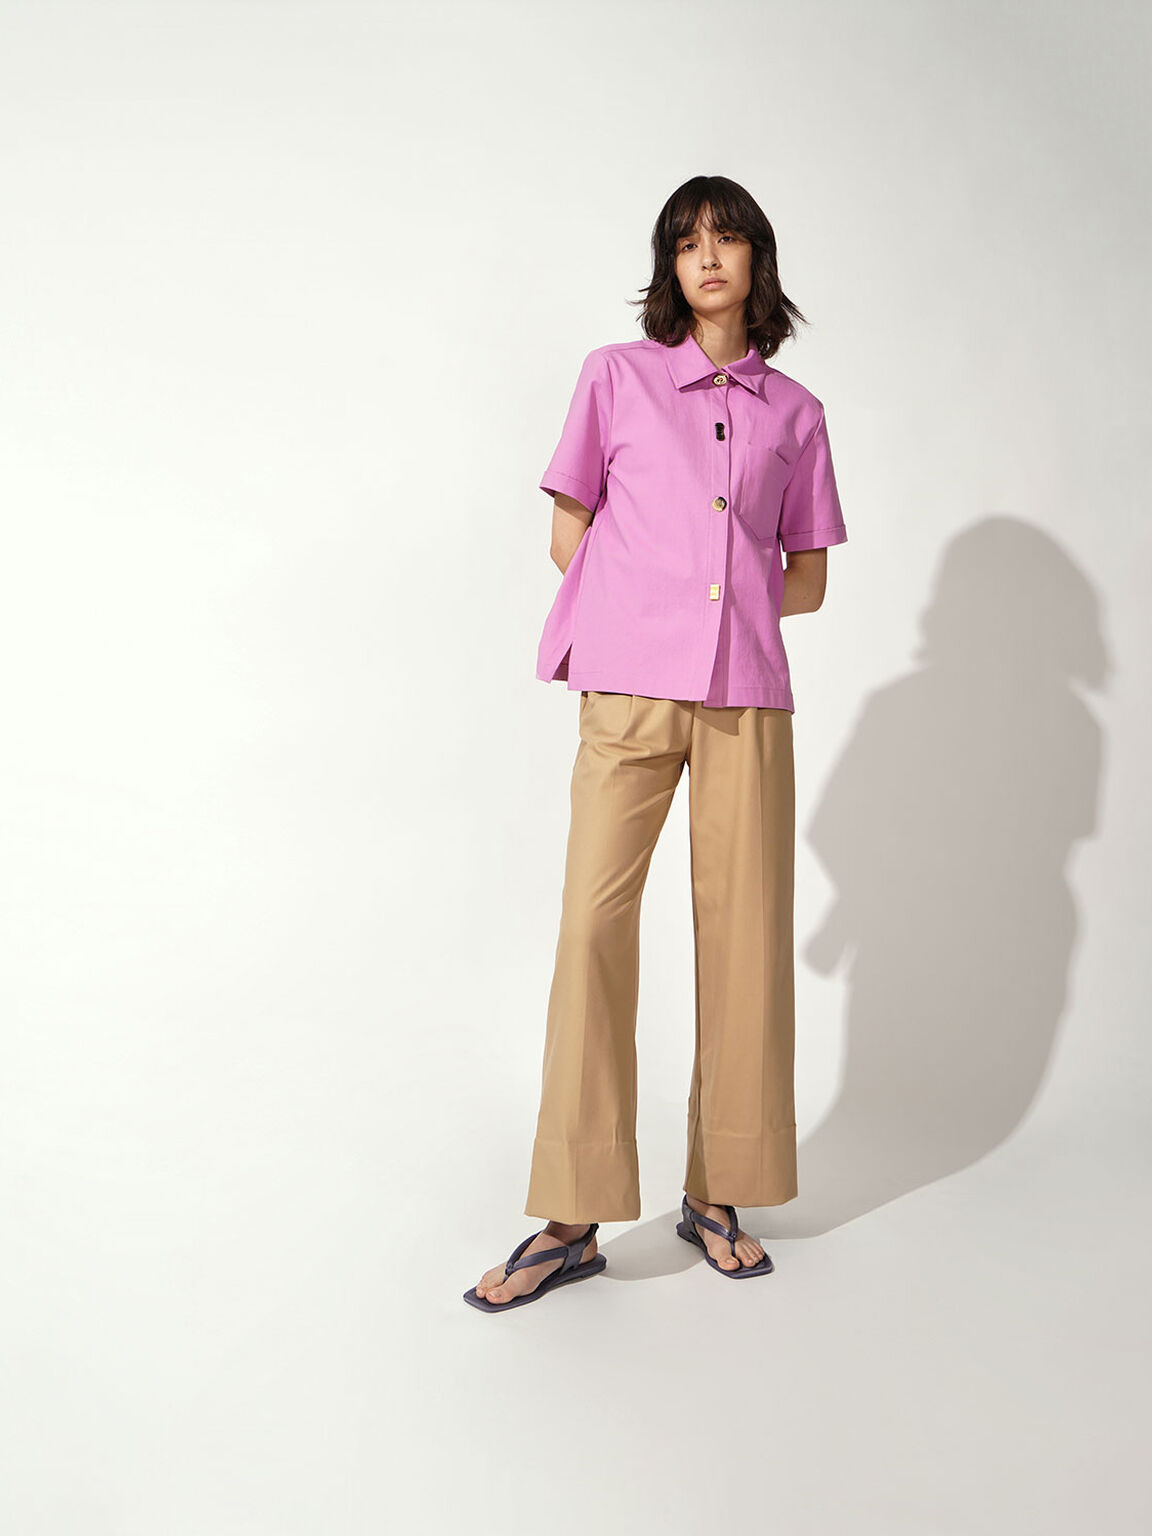 Puffy Strap Thong Sandals, Lilac Grey, hi-res